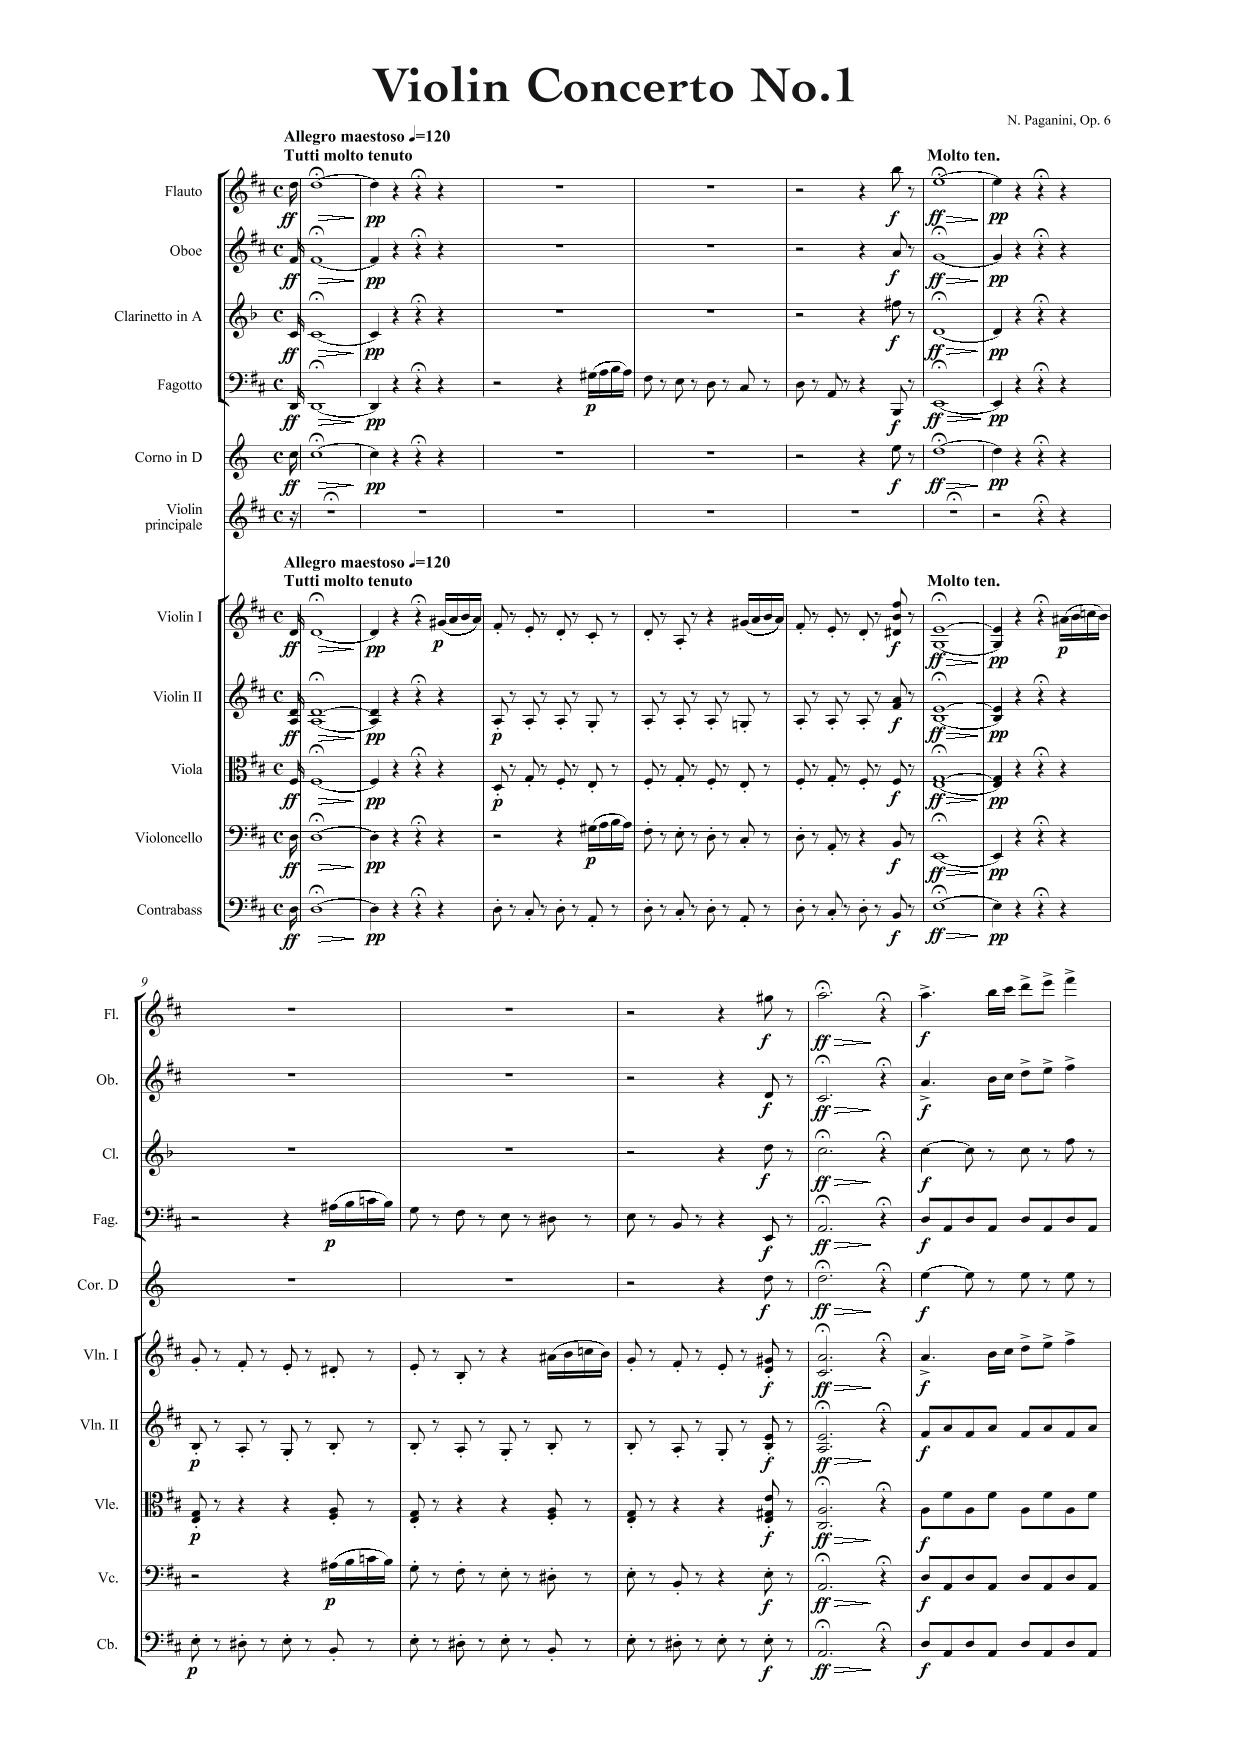 Paganini Violin Concerto No. 1